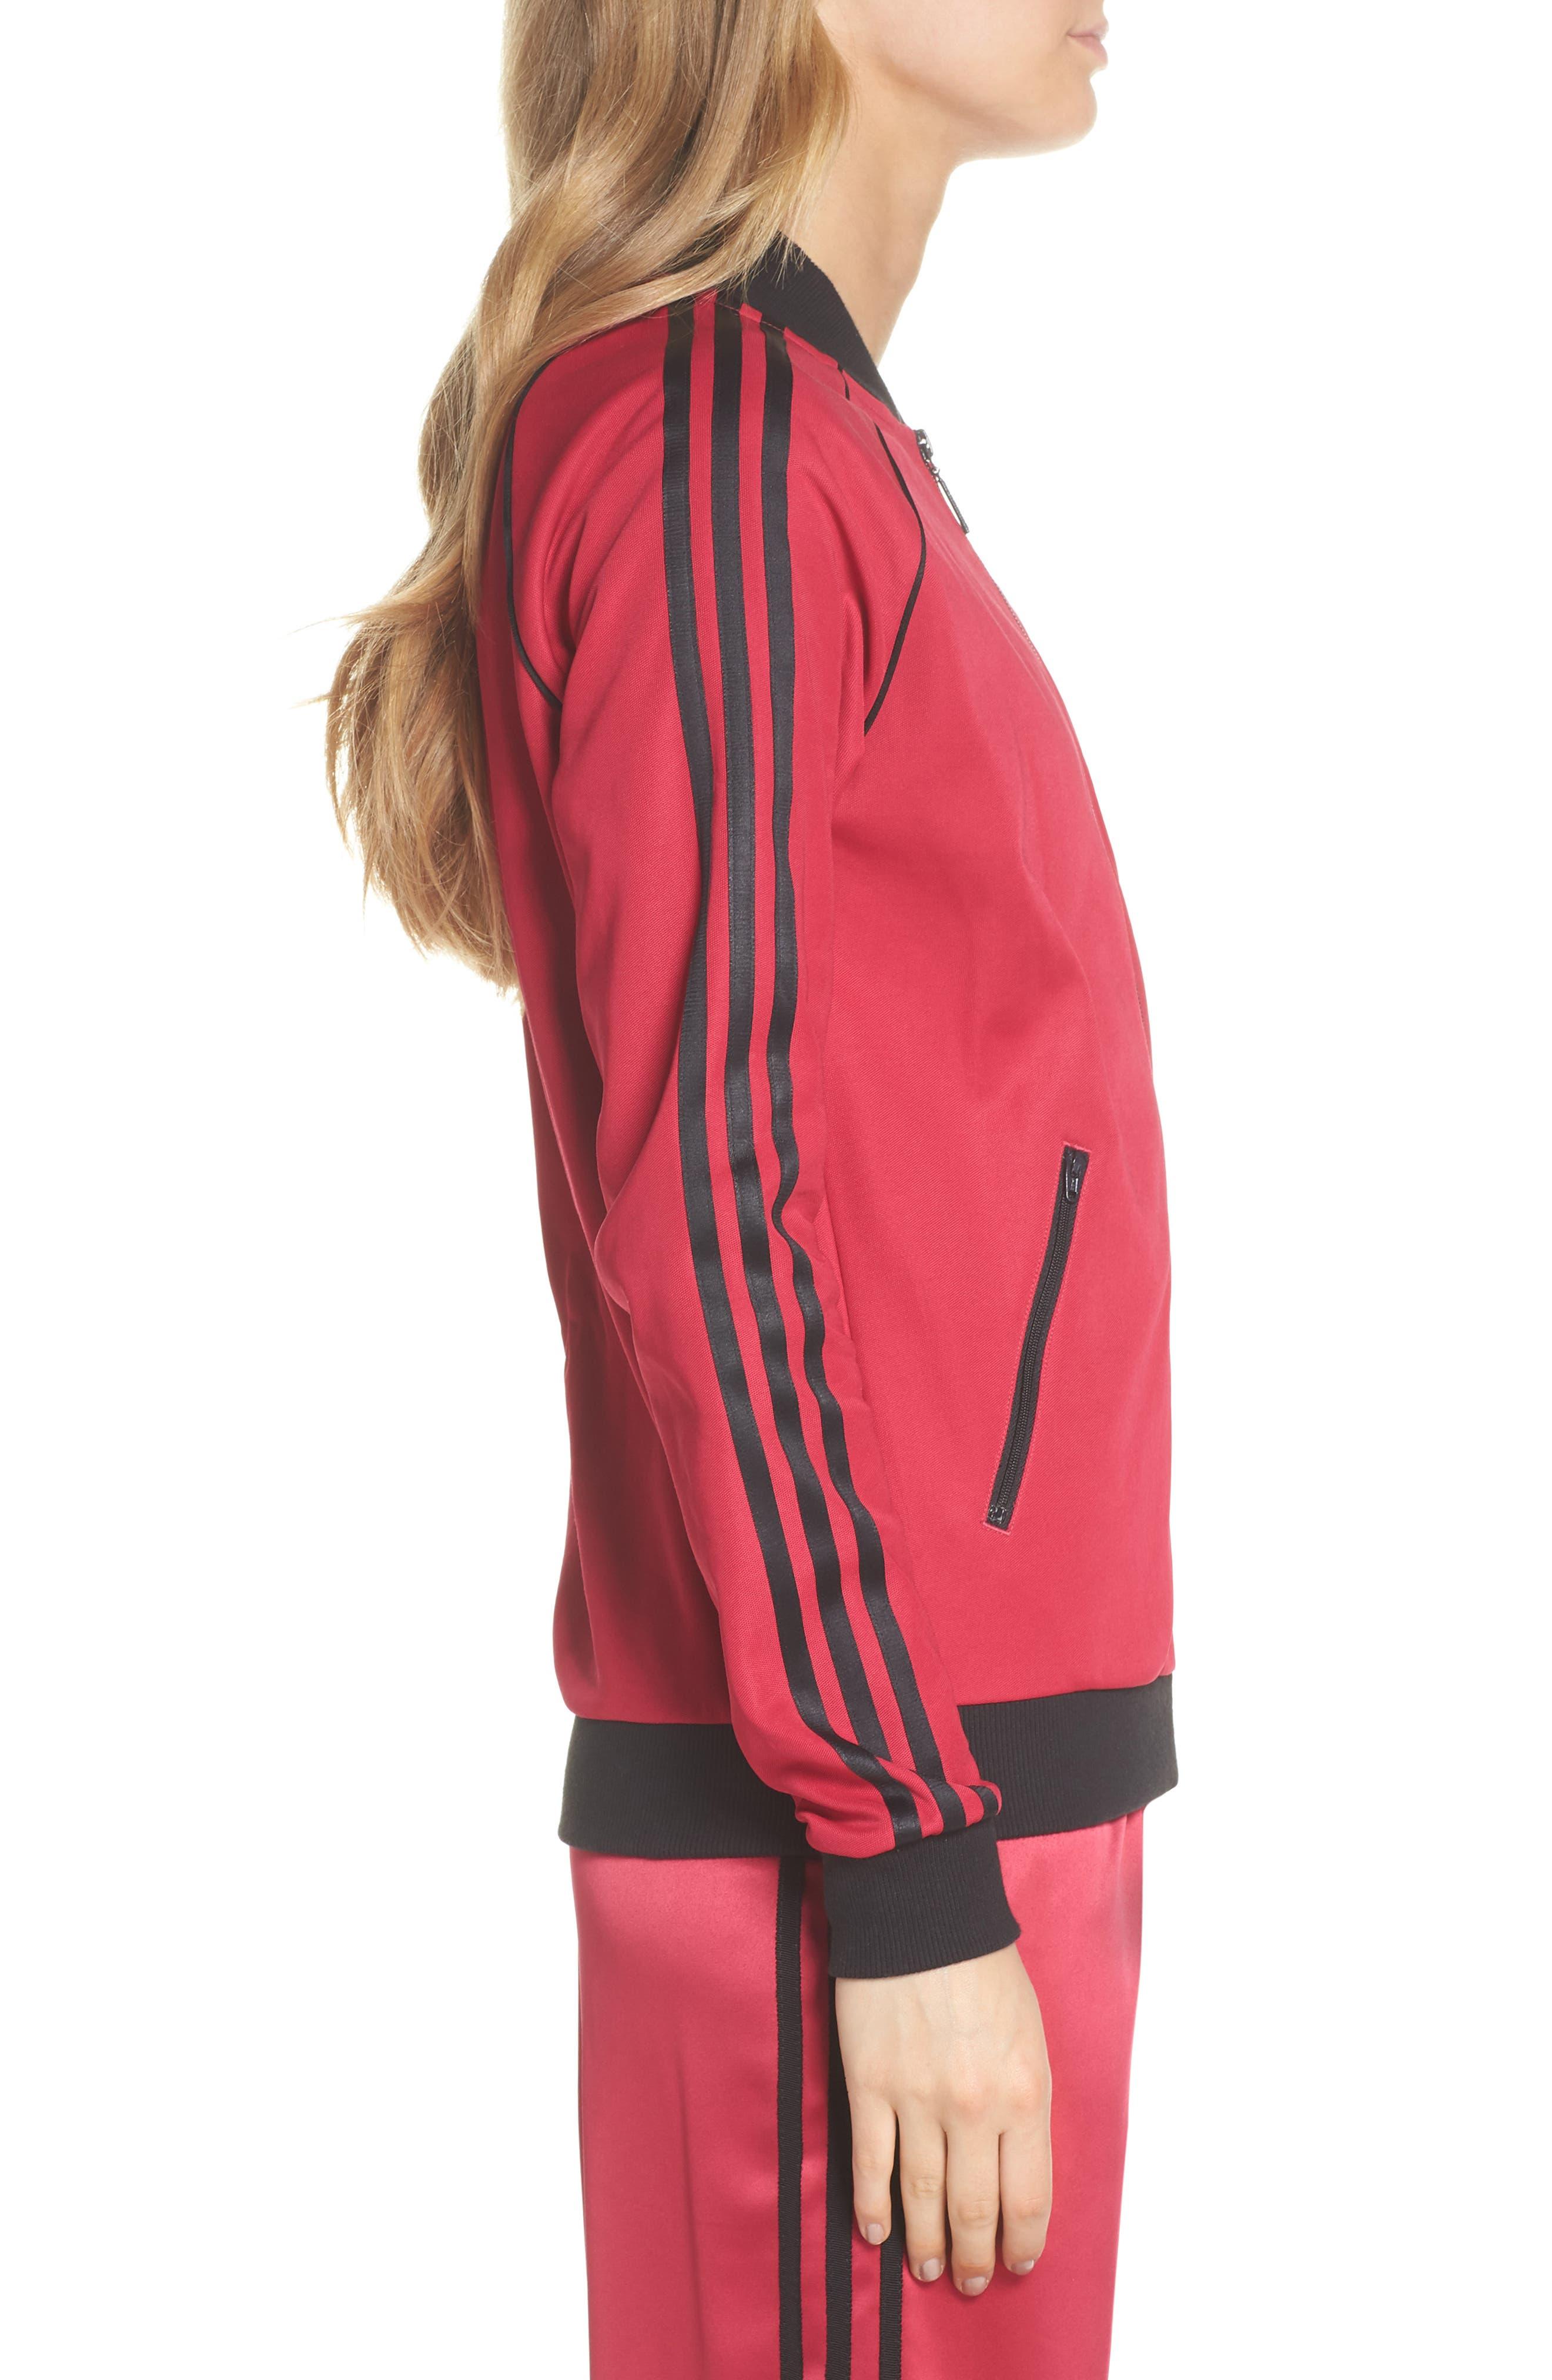 adidas Track Jacket,                             Alternate thumbnail 3, color,                             650